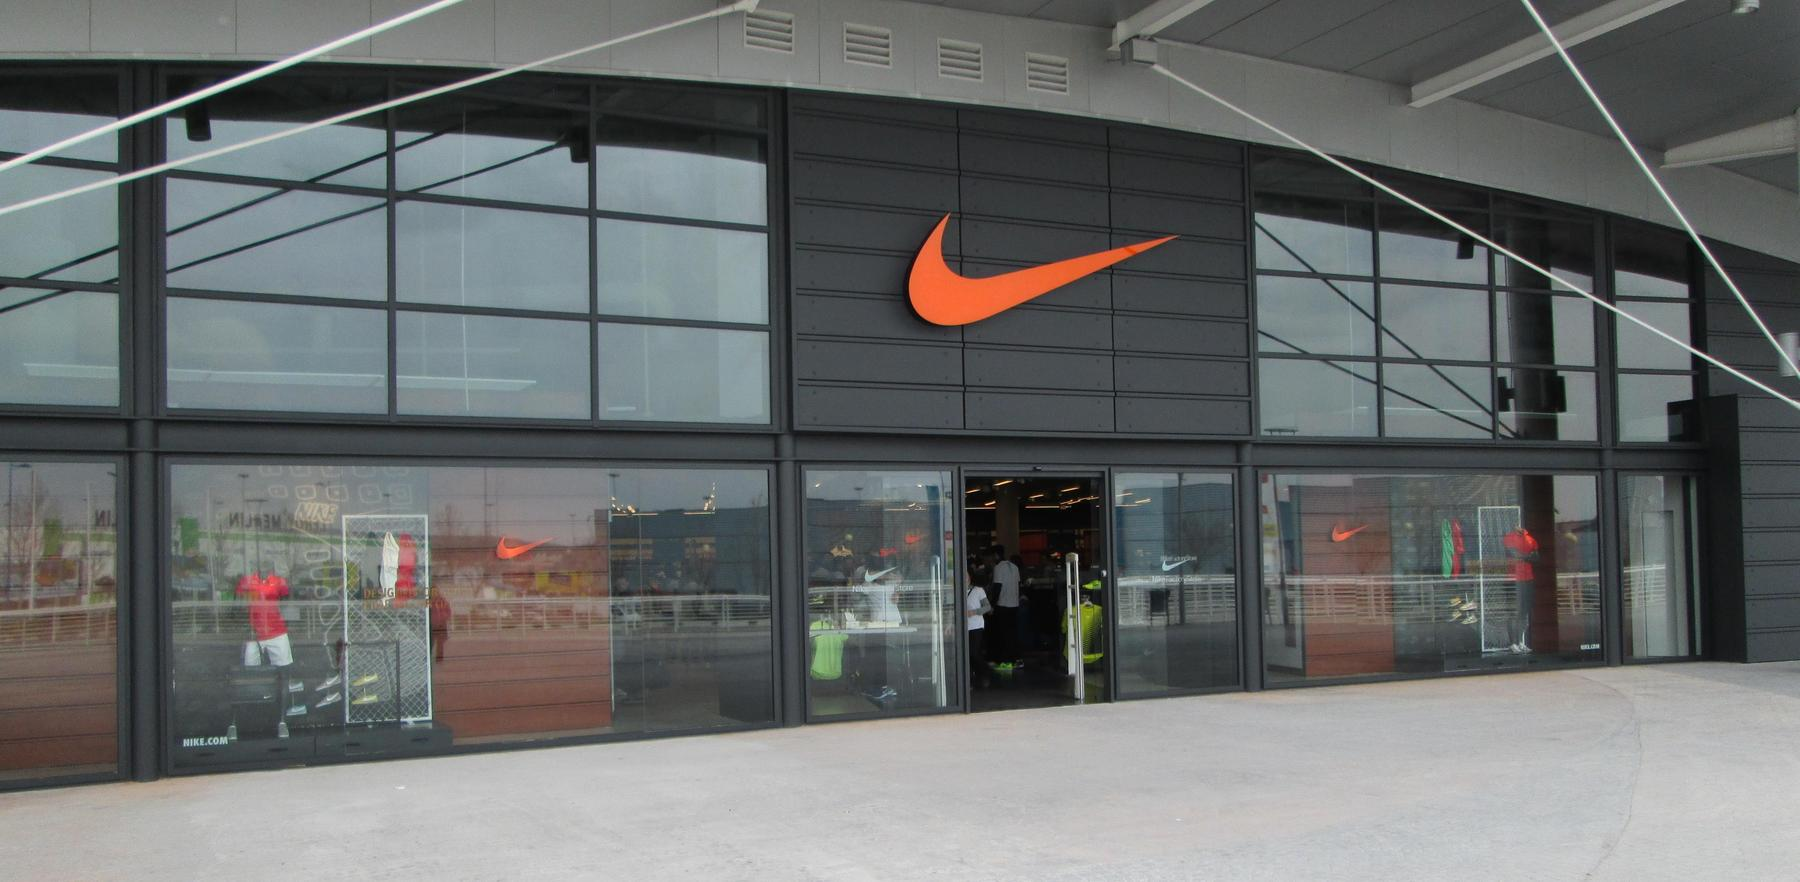 8cb749ca59587 Nike Factory Store Madrid H2O. Rivas Vaciamadrid